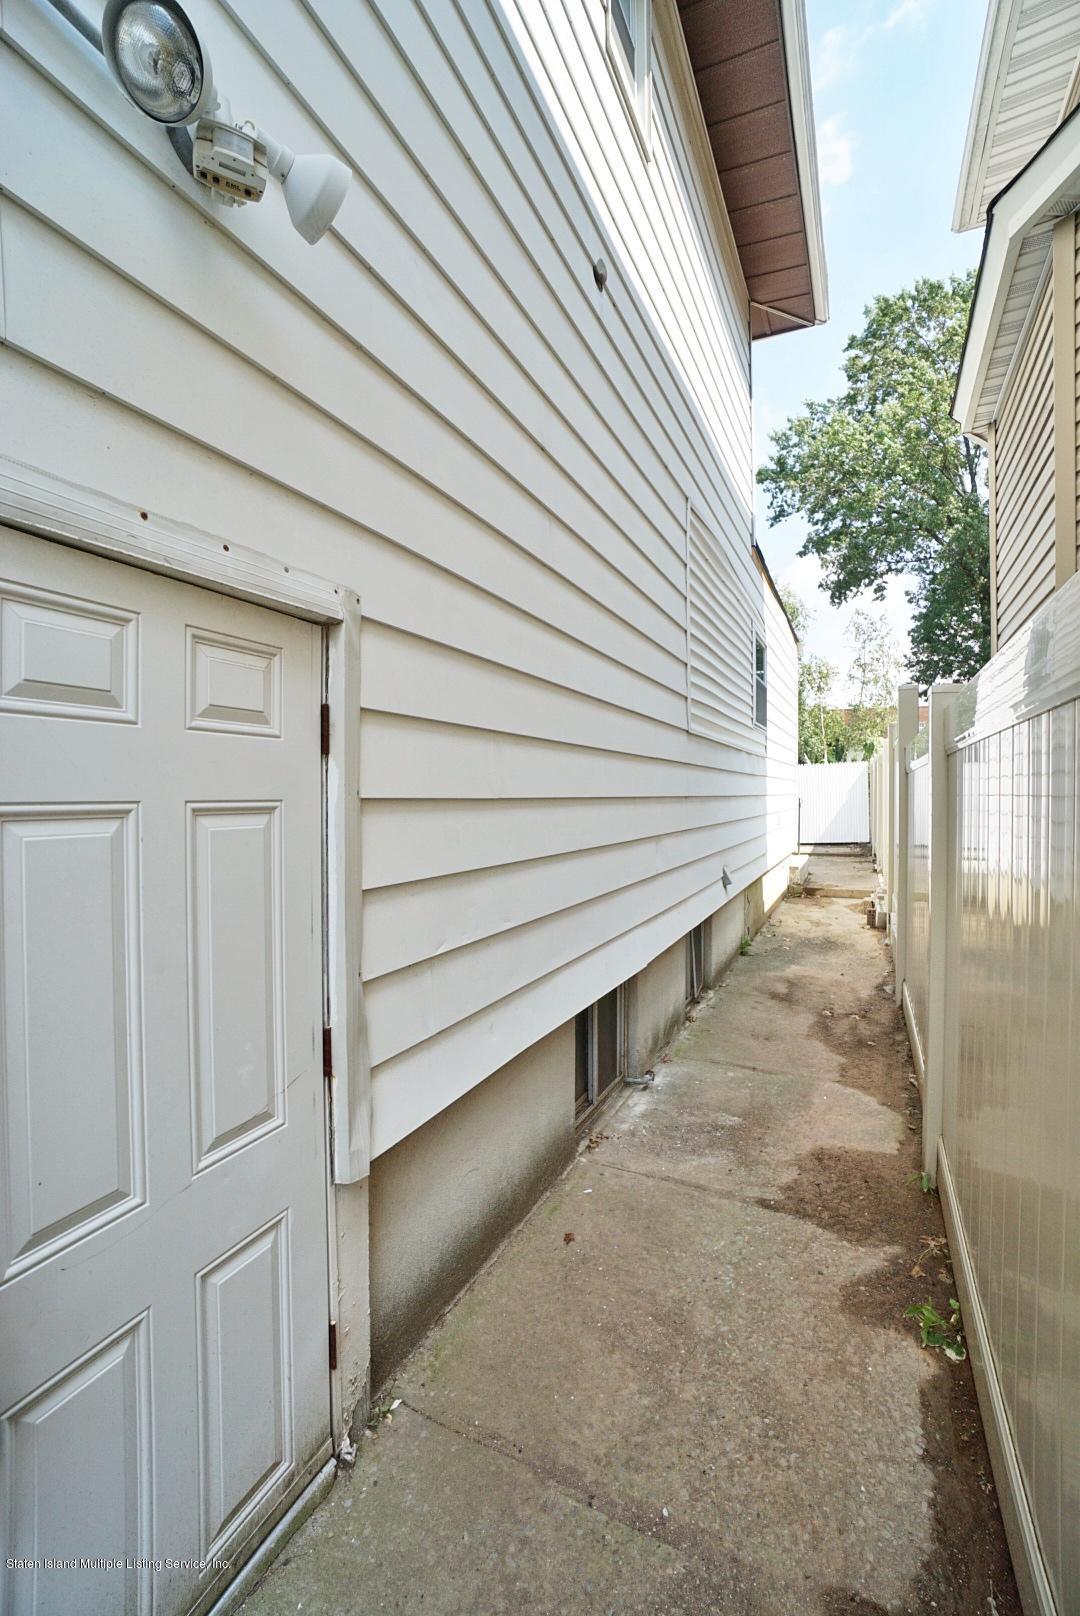 Single Family - Detached 53 Dubois Avenue  Staten Island, NY 10310, MLS-1128749-48